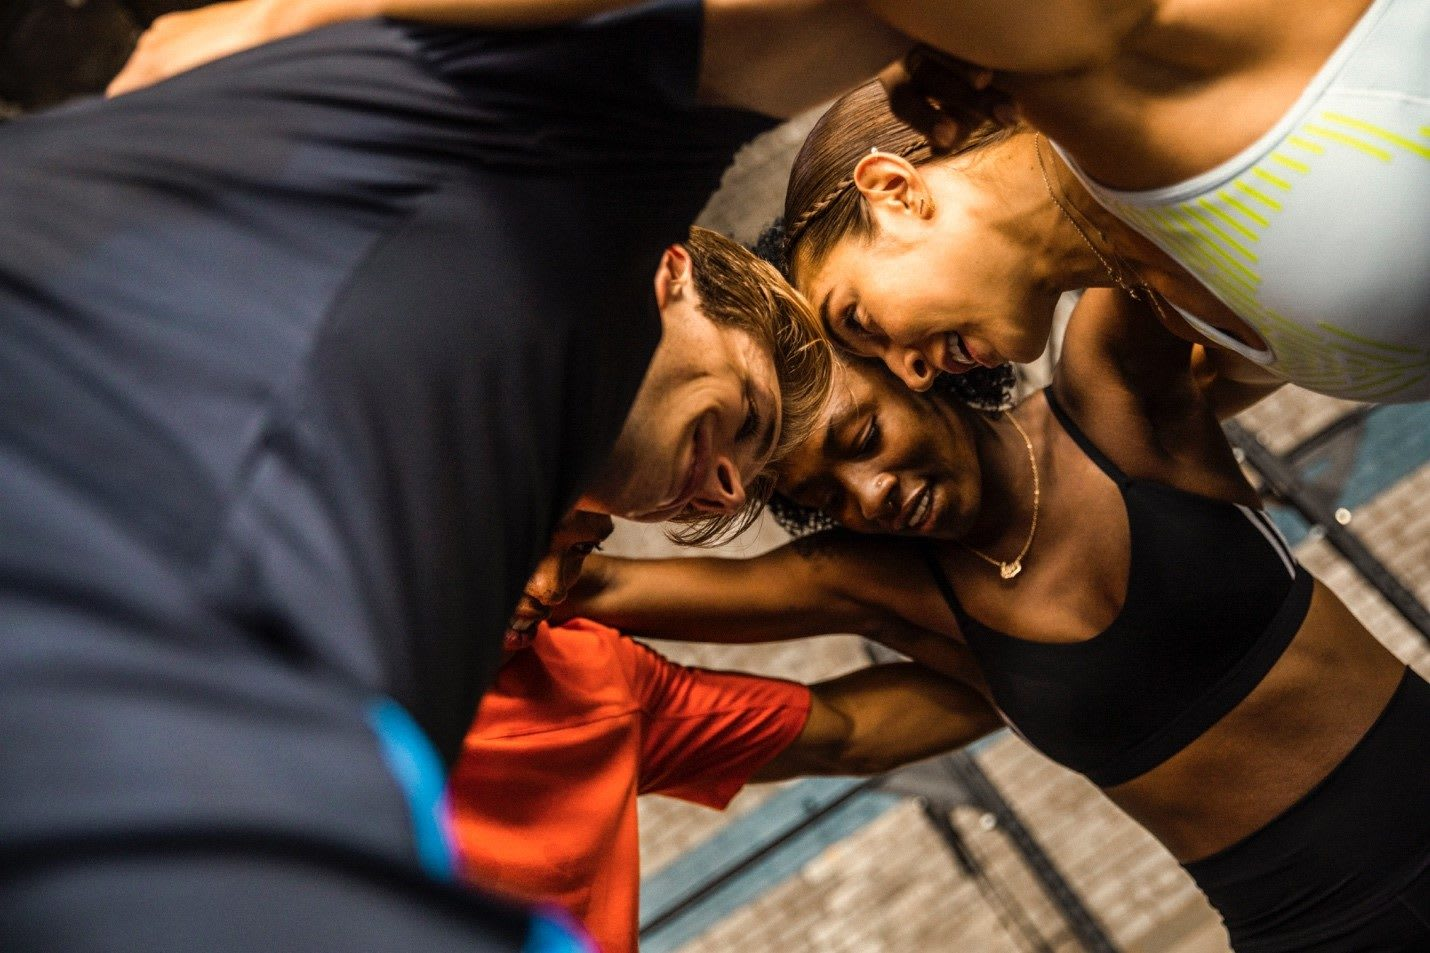 Men and women training indoors. accountability partner, GamePlanA